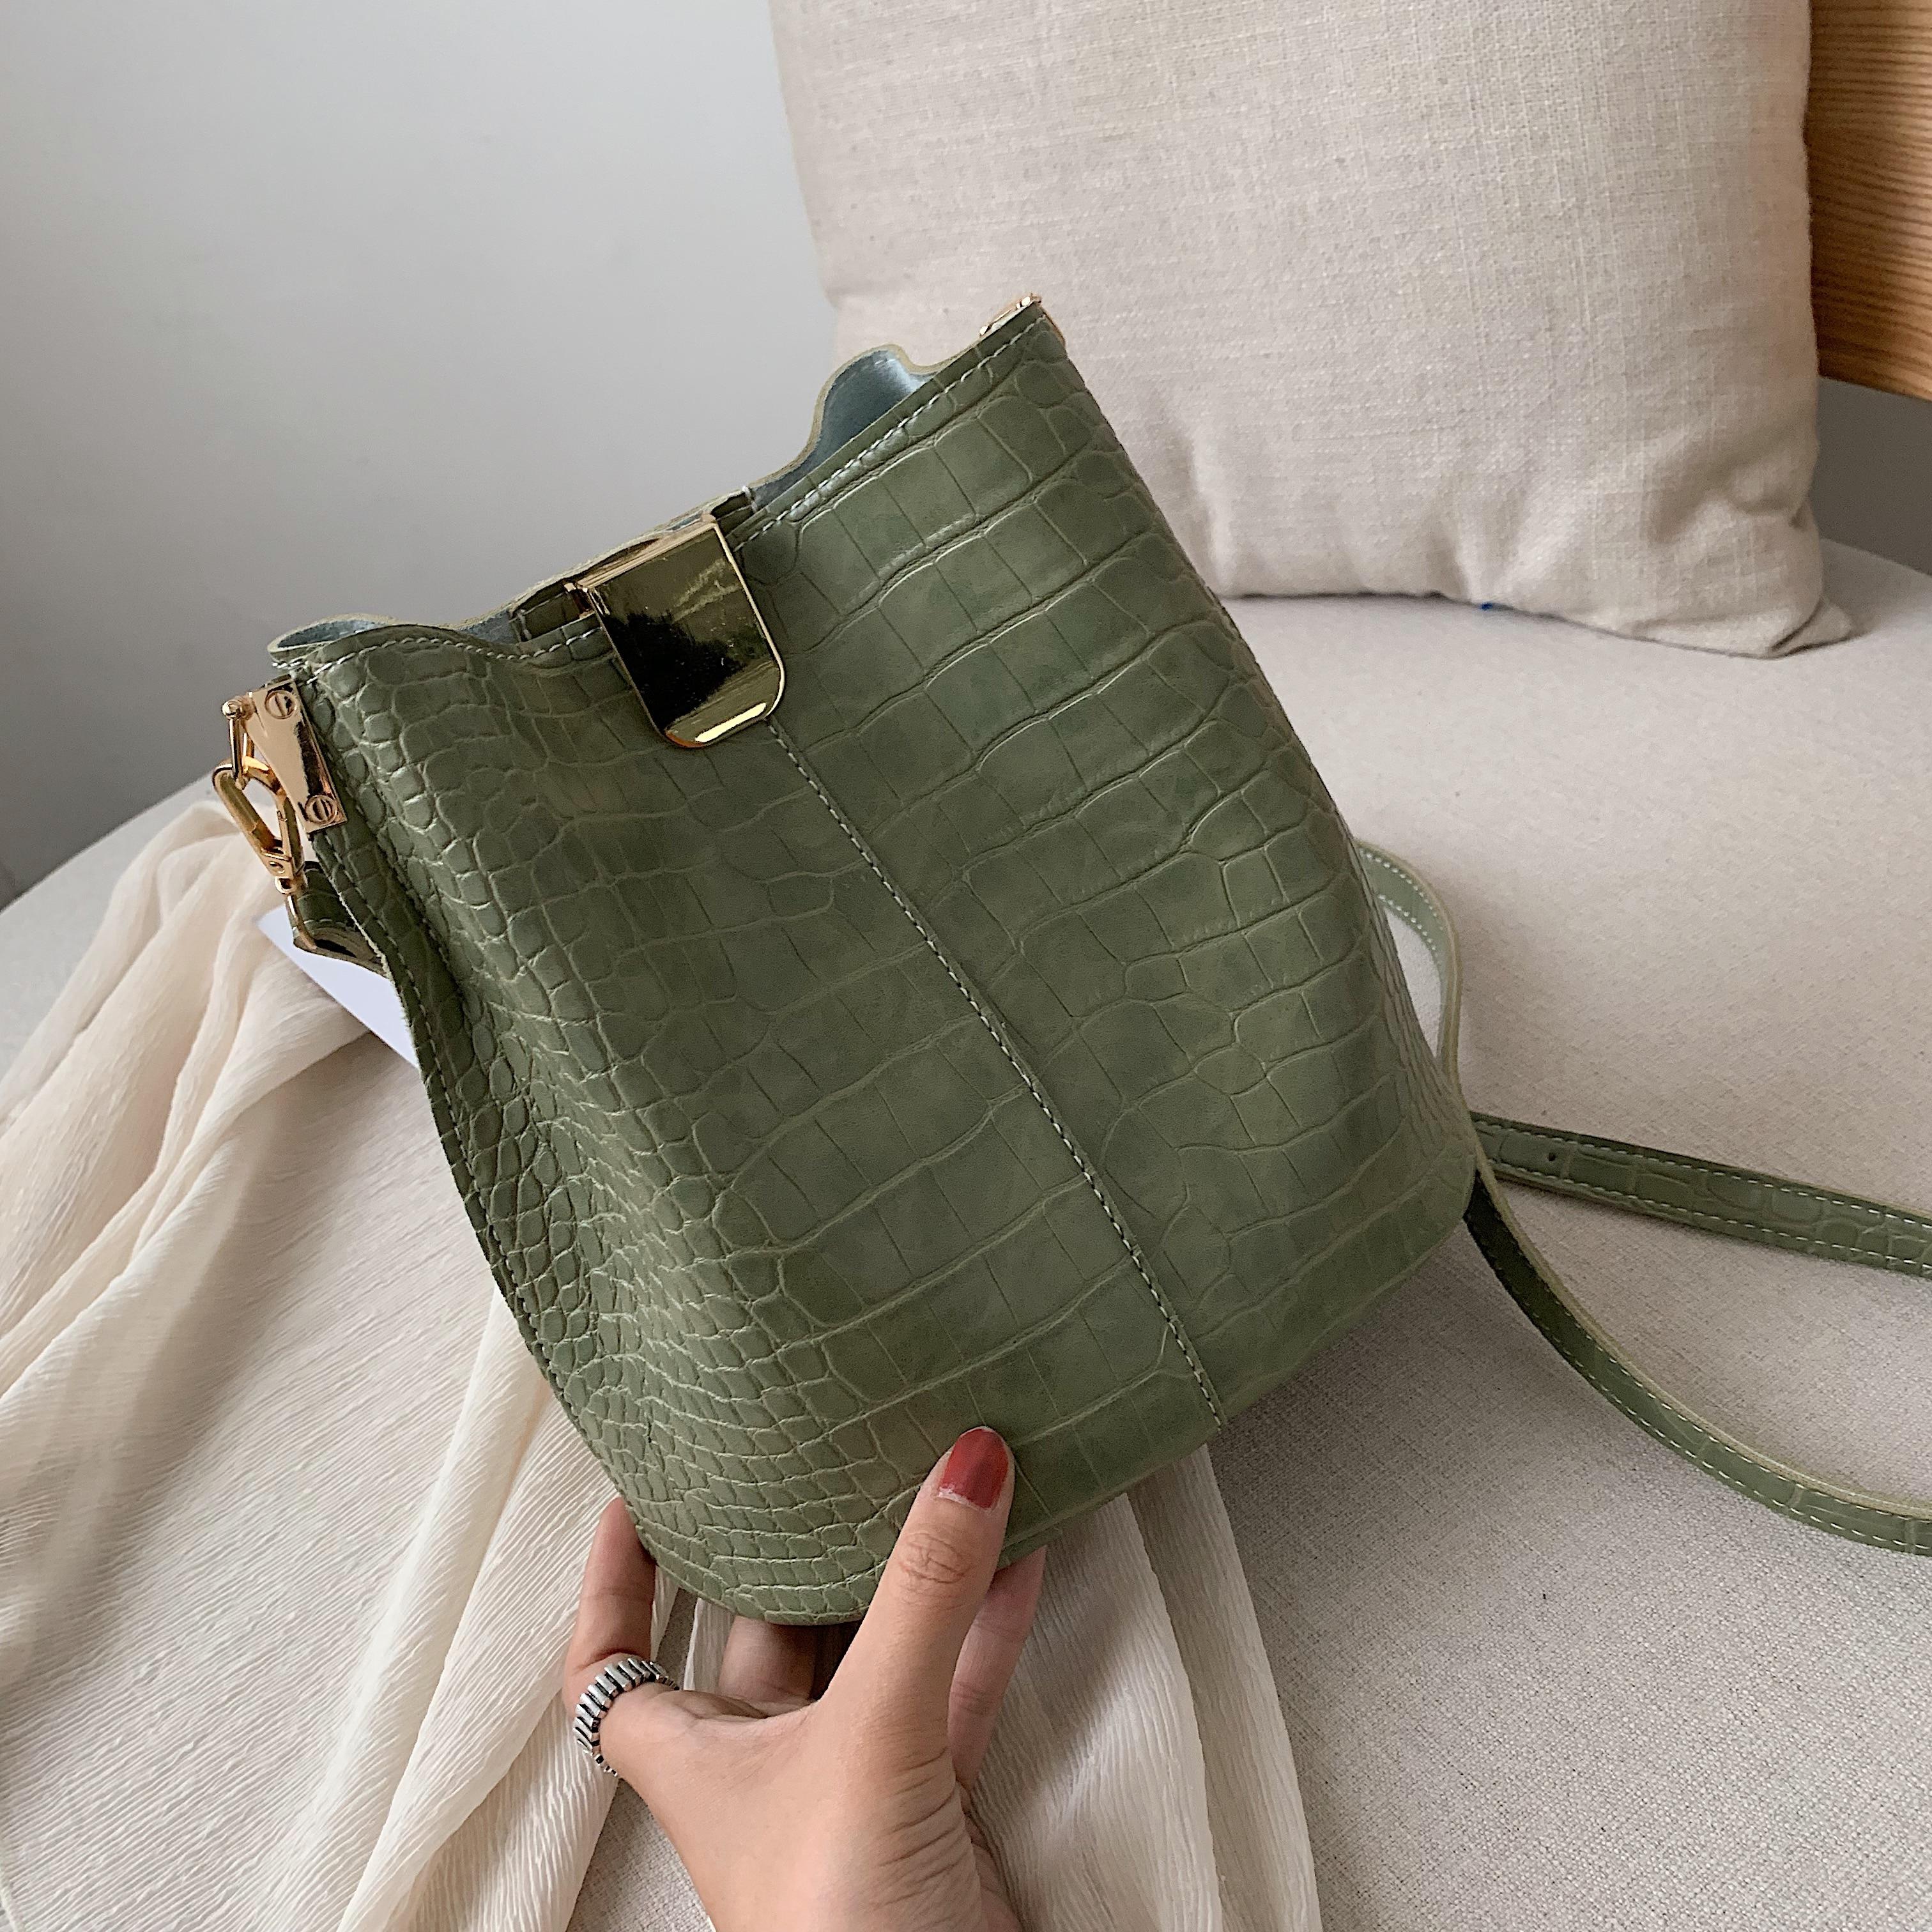 Crocodile Pattern PU Leather Bucket Crossbody Bags For Women Small Summer Messenger Shoulder Bags Ladies Travel Handbags